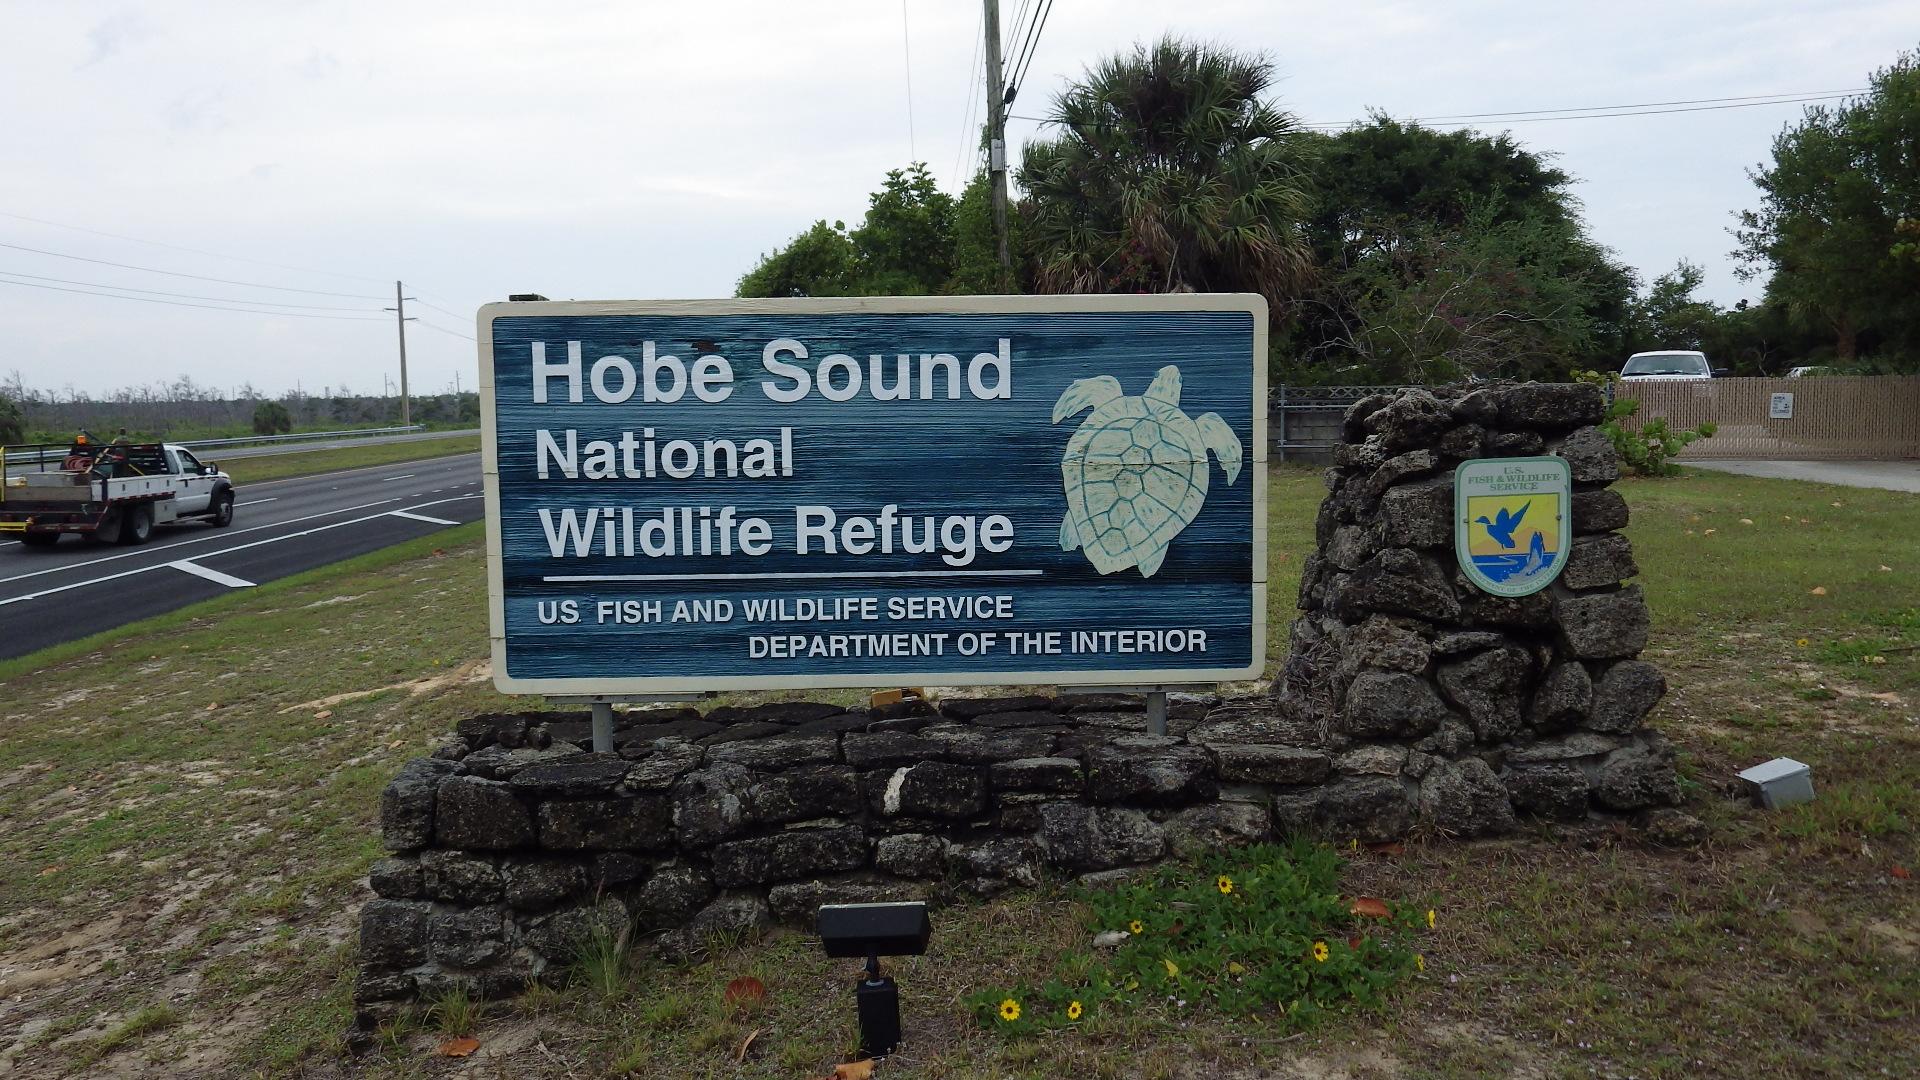 Hobe Sound Nature Center at the National Wildlife Reguge Image